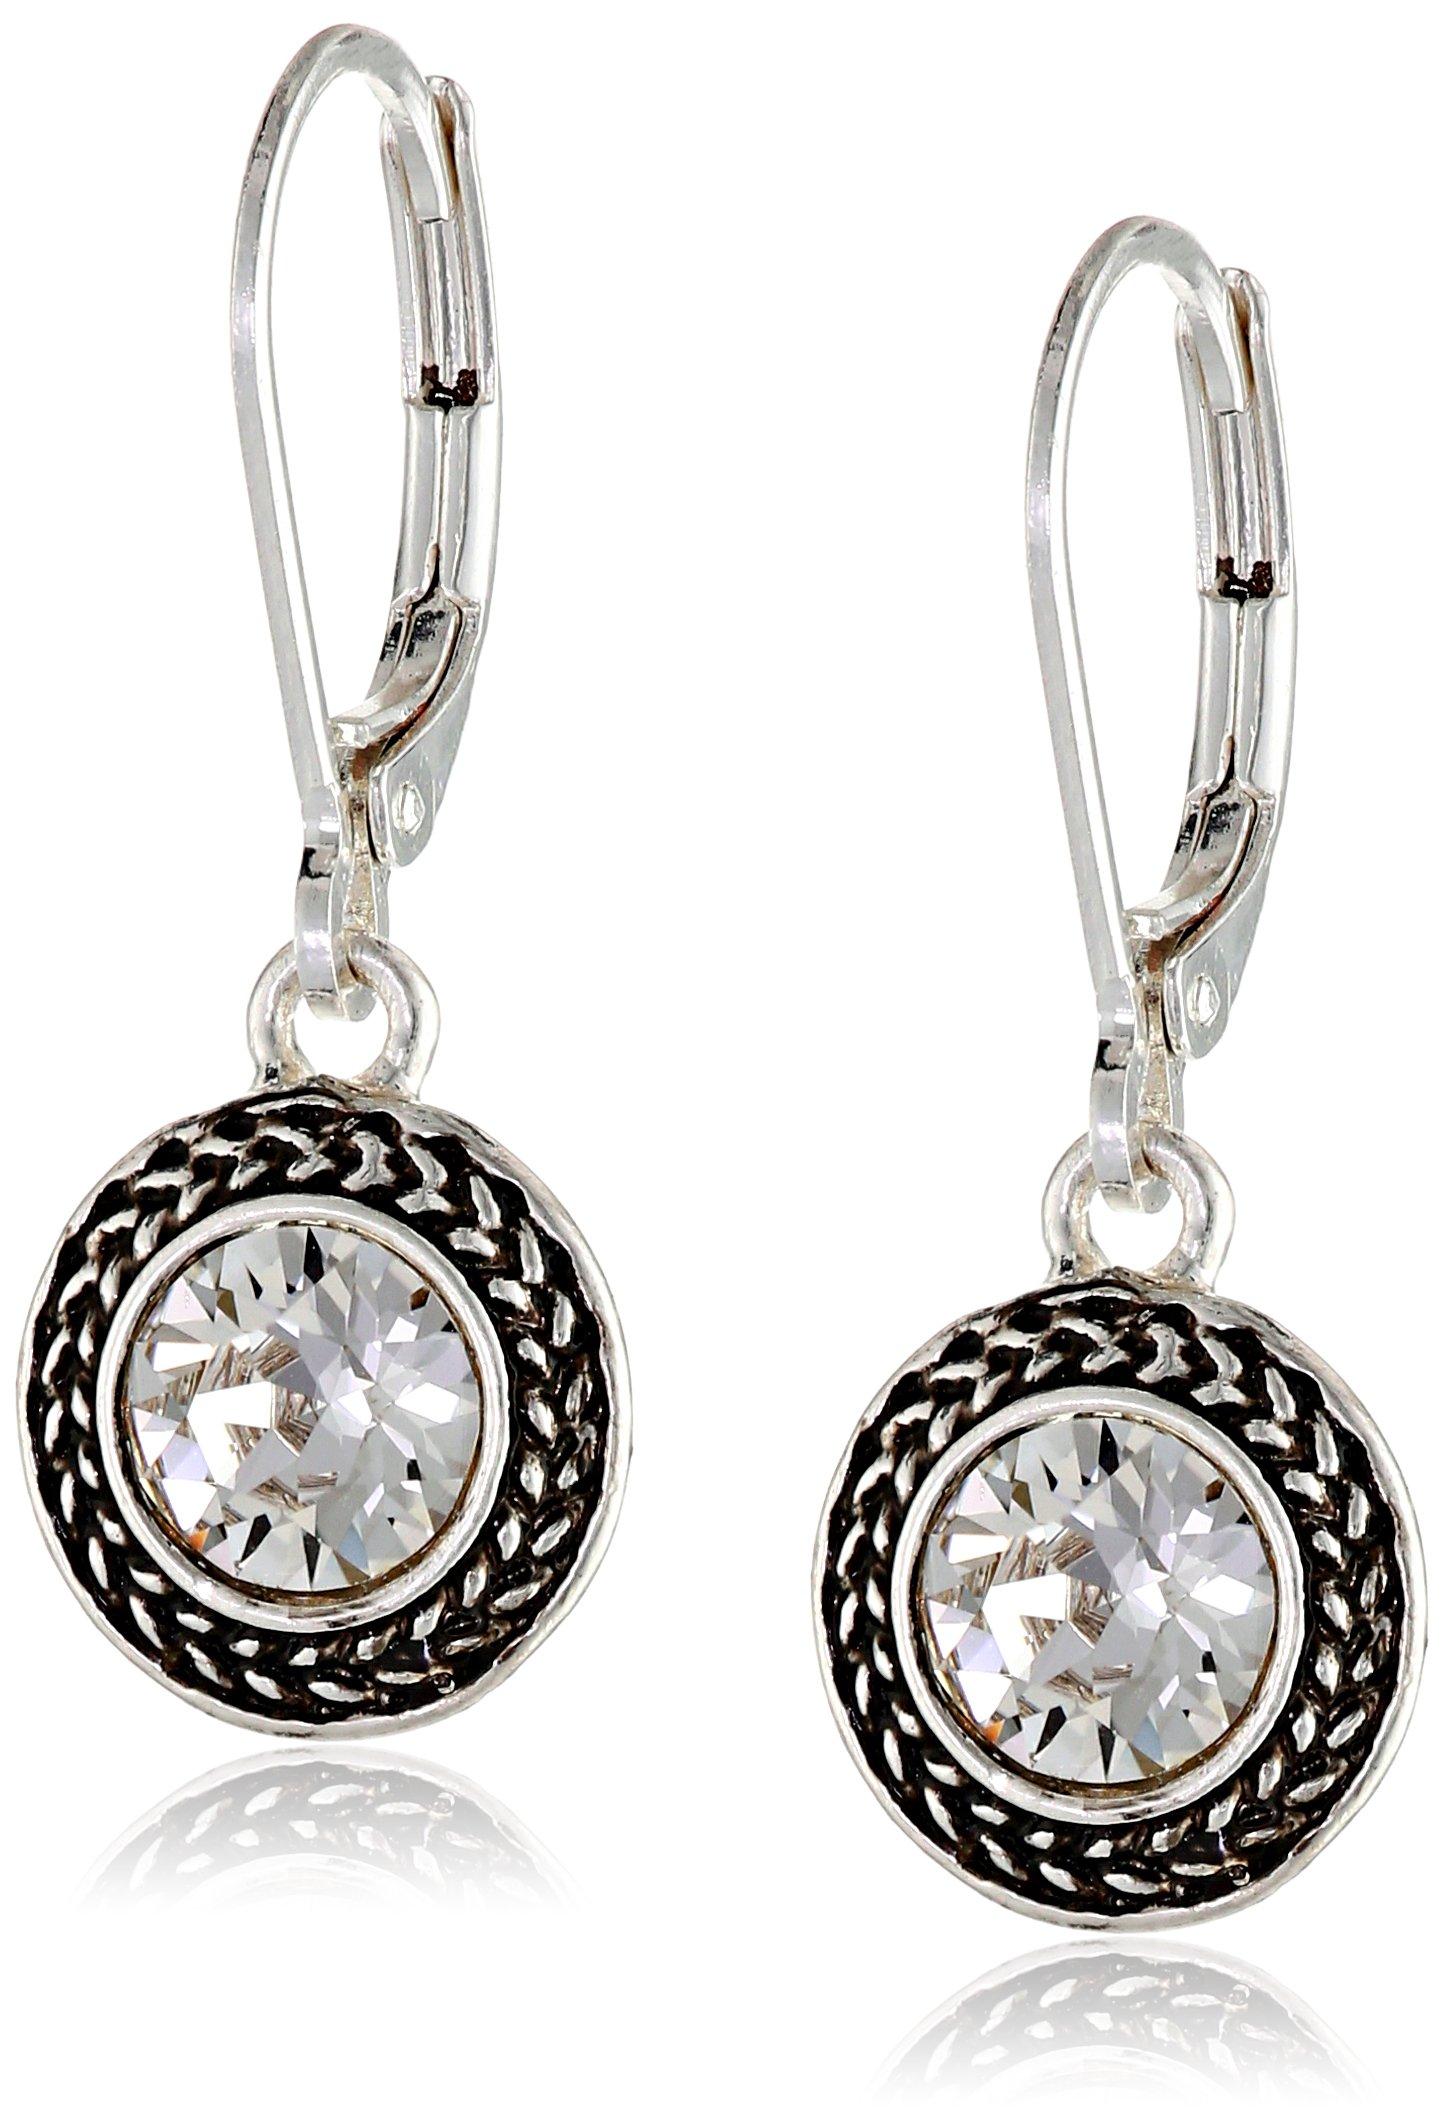 Napier ''Color Declaration'' Silver-Tone Crystal Swarovski Stone Leverback Drop Earrings by Napier